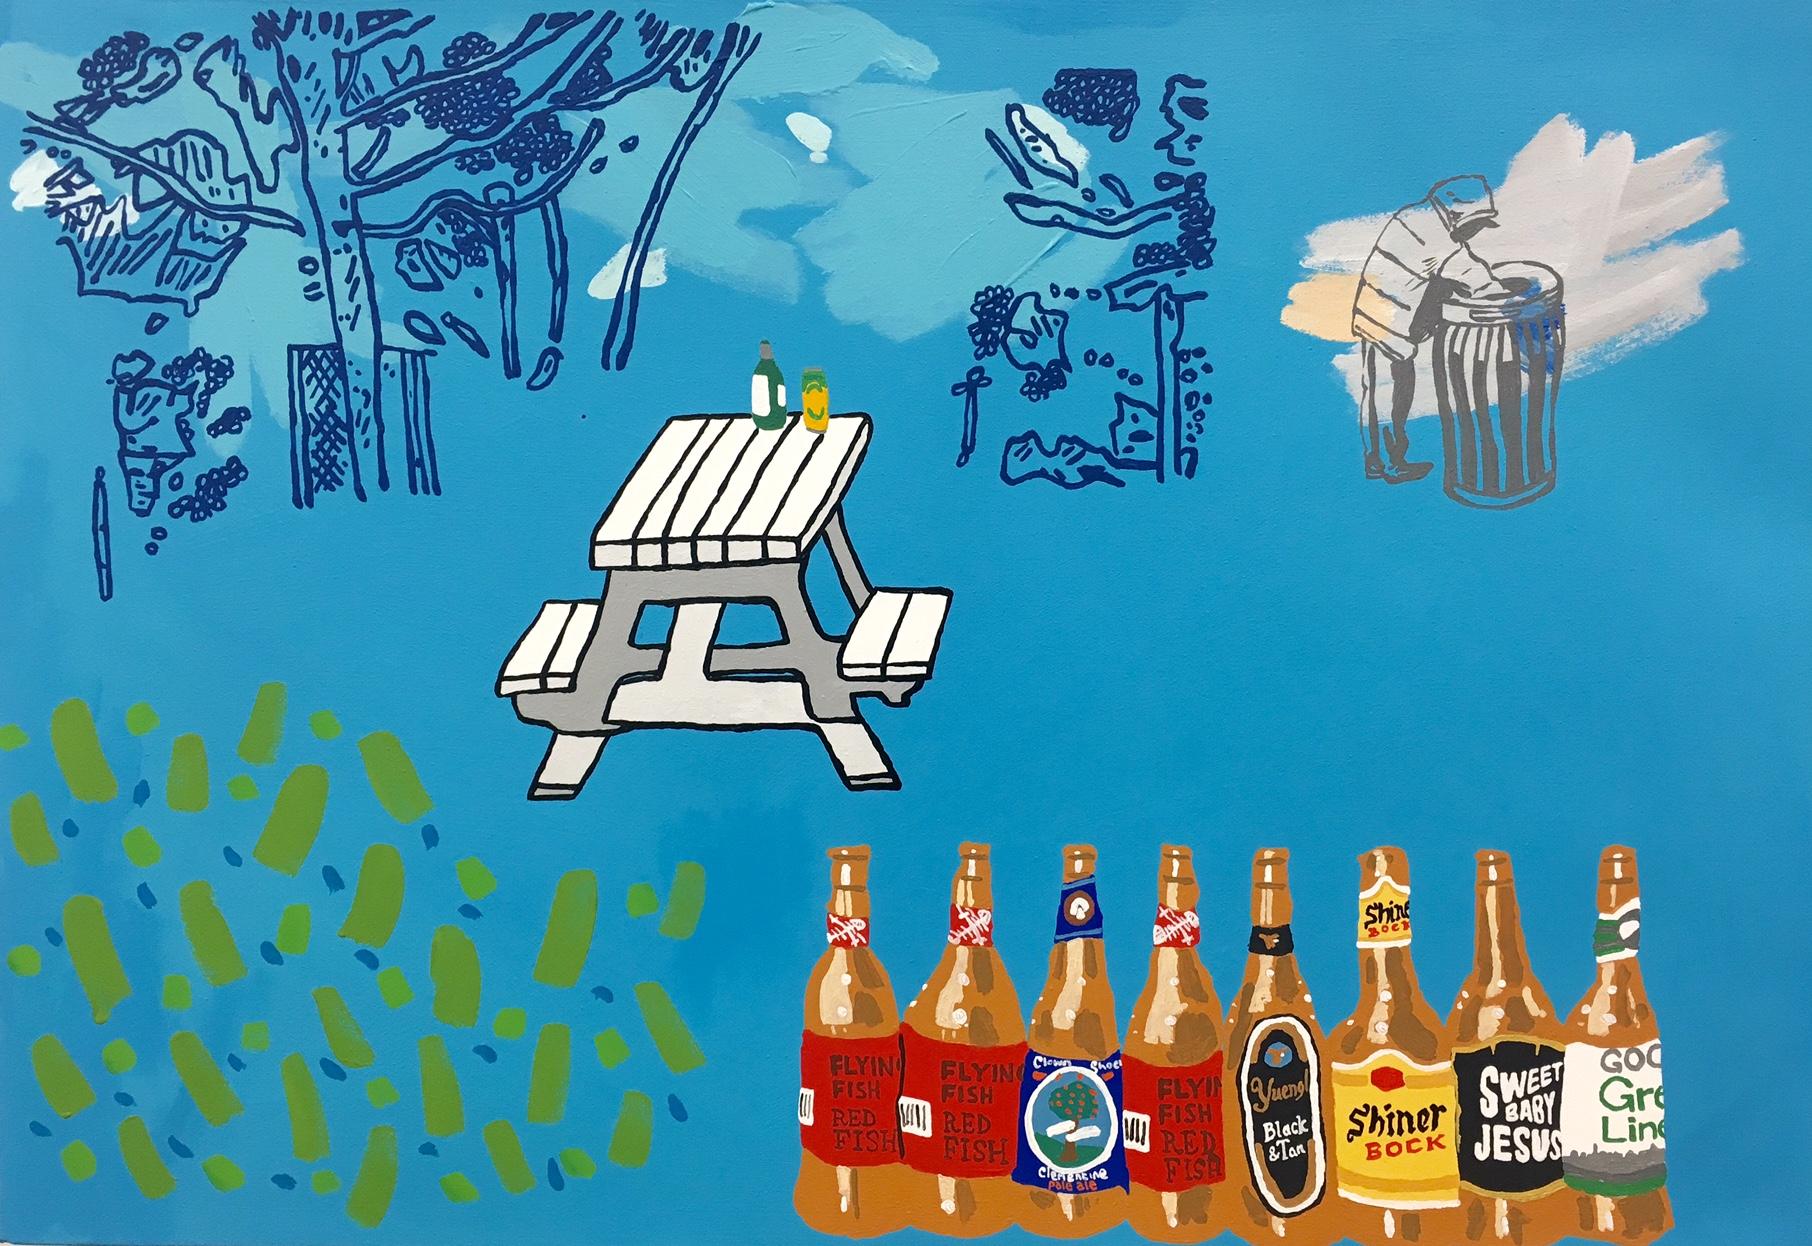 Homeless, Park Bench, Craft Beer